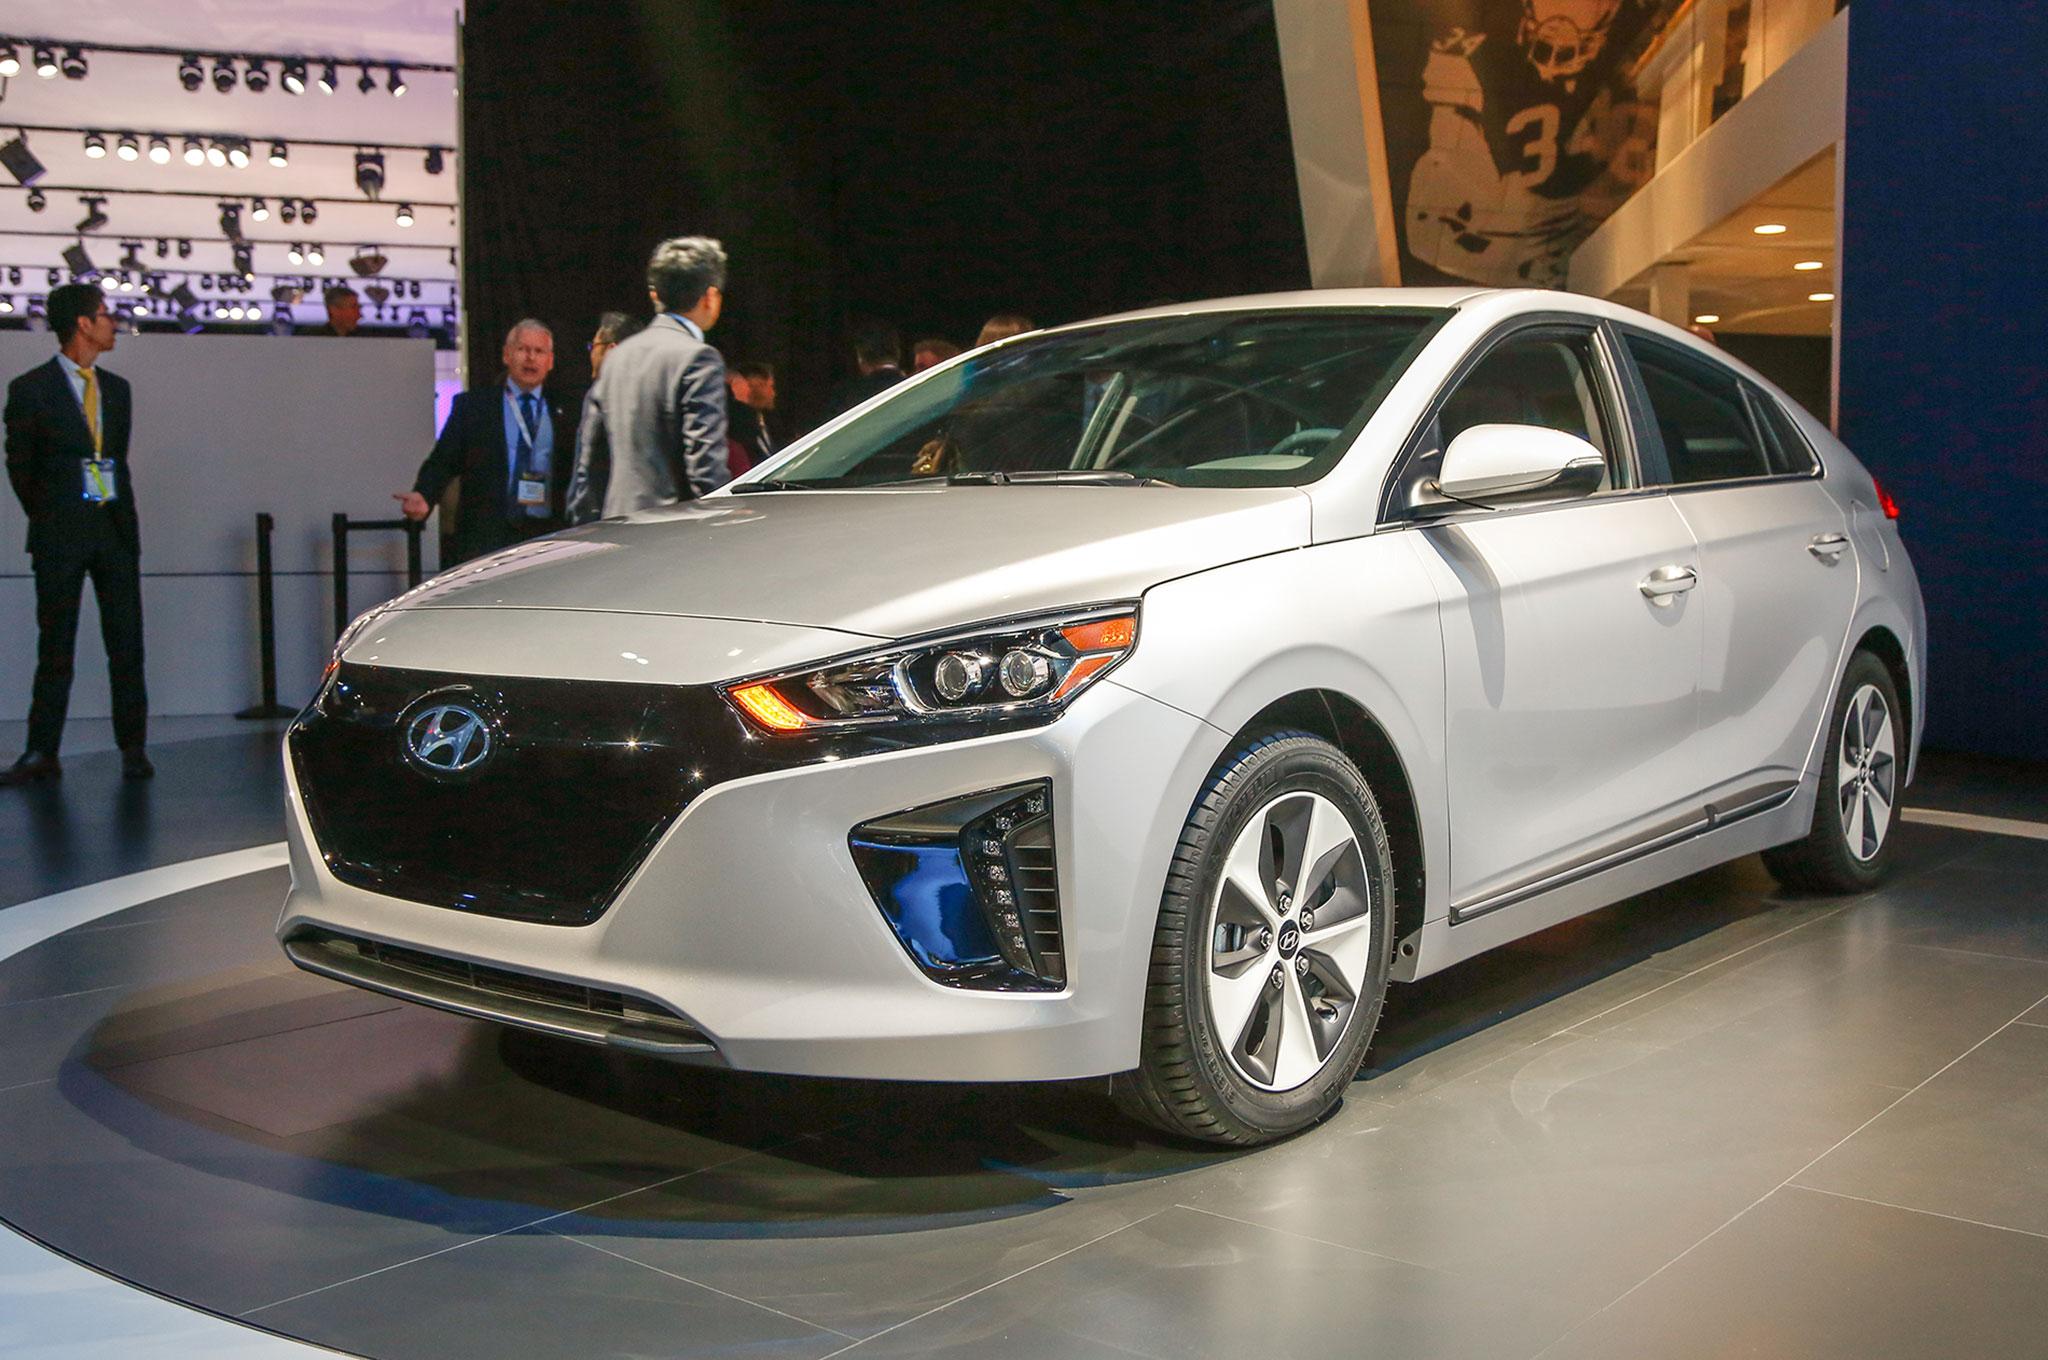 http://st.automobilemag.com/uploads/sites/11/2016/03/2017-Hyundai-Ioniq-Electric-front-three-quarter-01.jpg